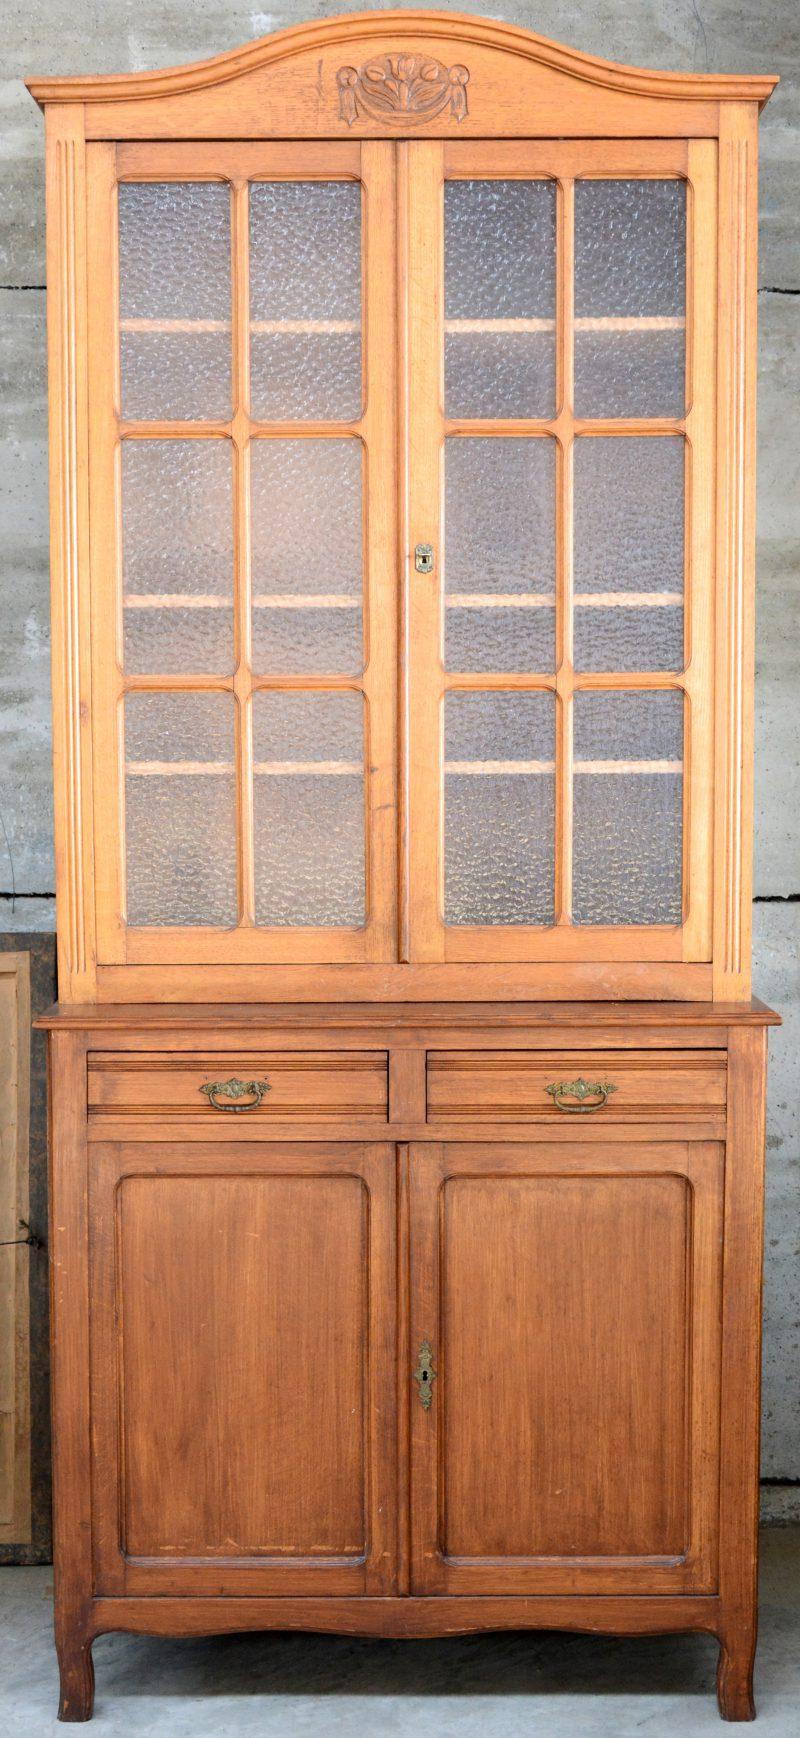 Een sobere tweeledige vitrinekast met onderaan twee deuren en twee laden en bovenaan twee gevitreerde deuren.